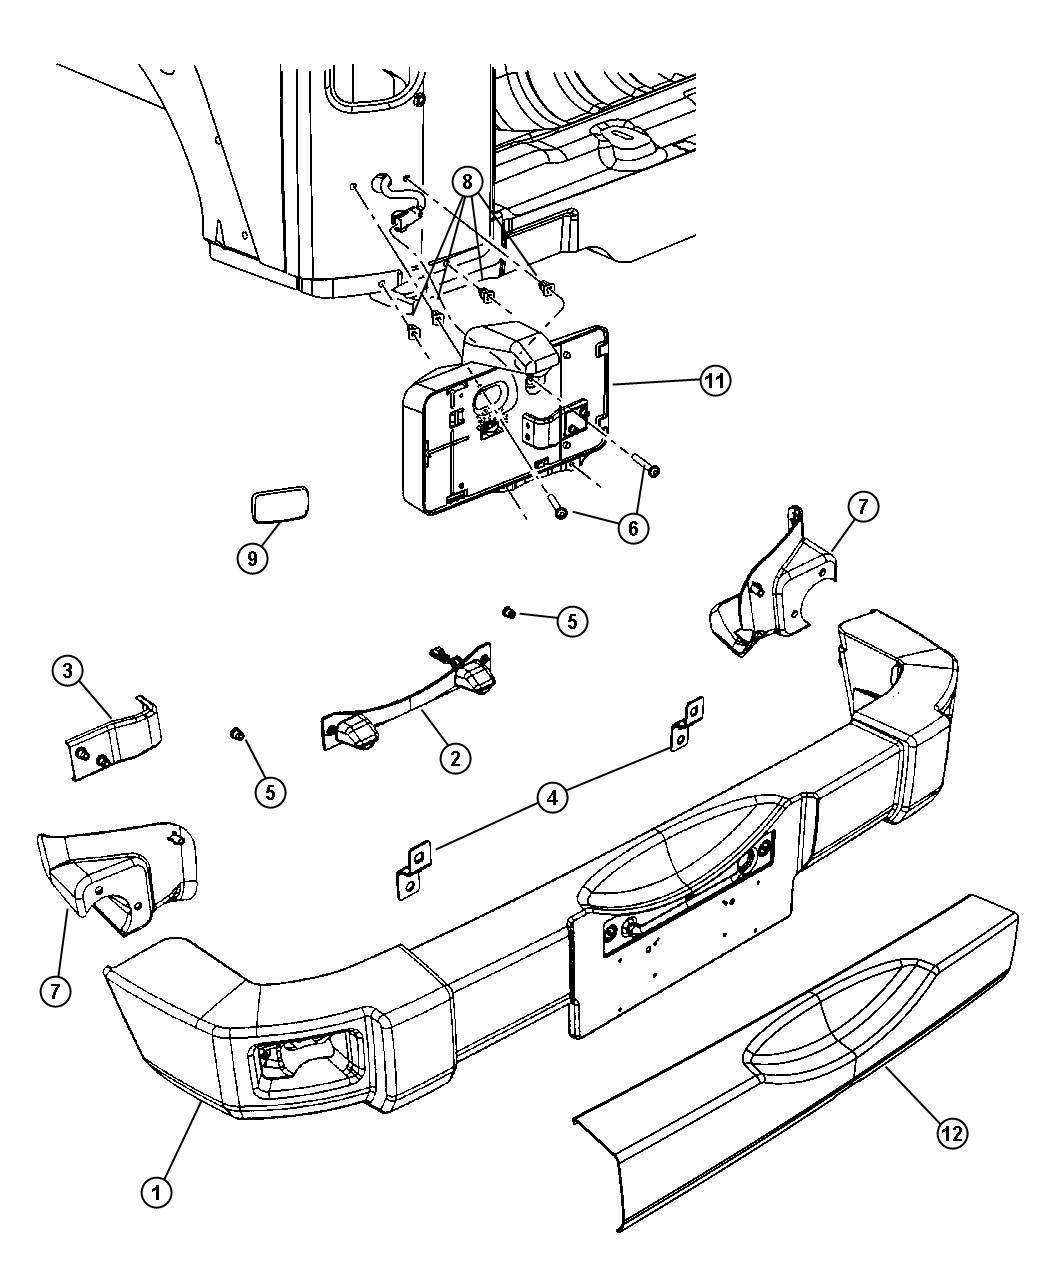 hight resolution of jeep grand cherokee rear bumper parts diagram jeep tj rear bumper stock jeep bumper 2016